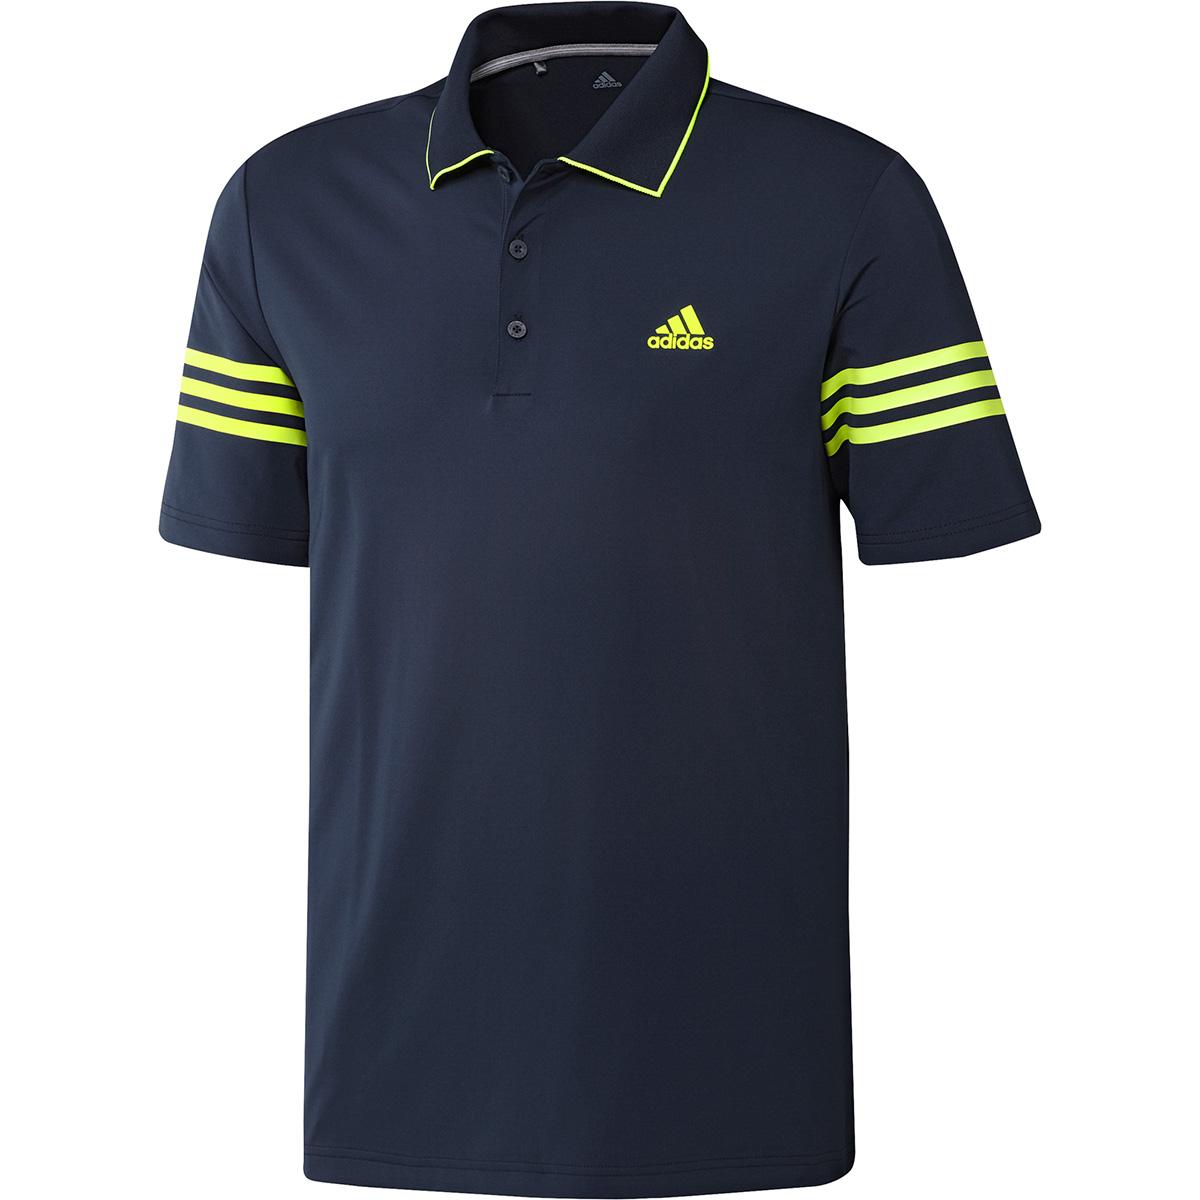 ULTIMATE365 スリーストライプス 半袖ポロシャツ